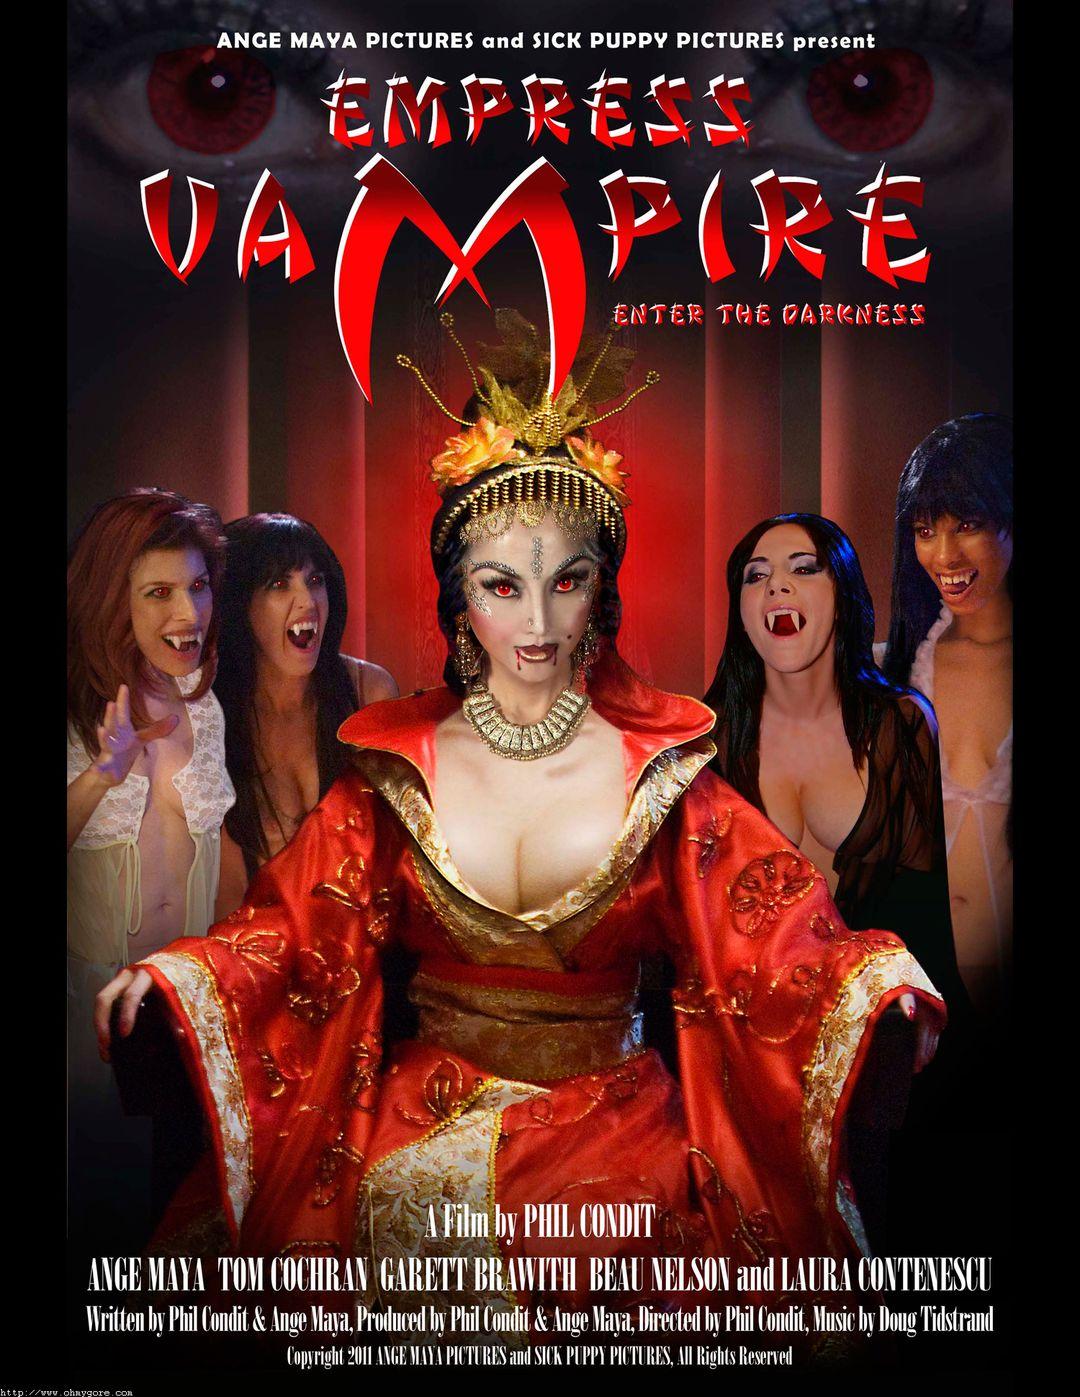 Vampir Film